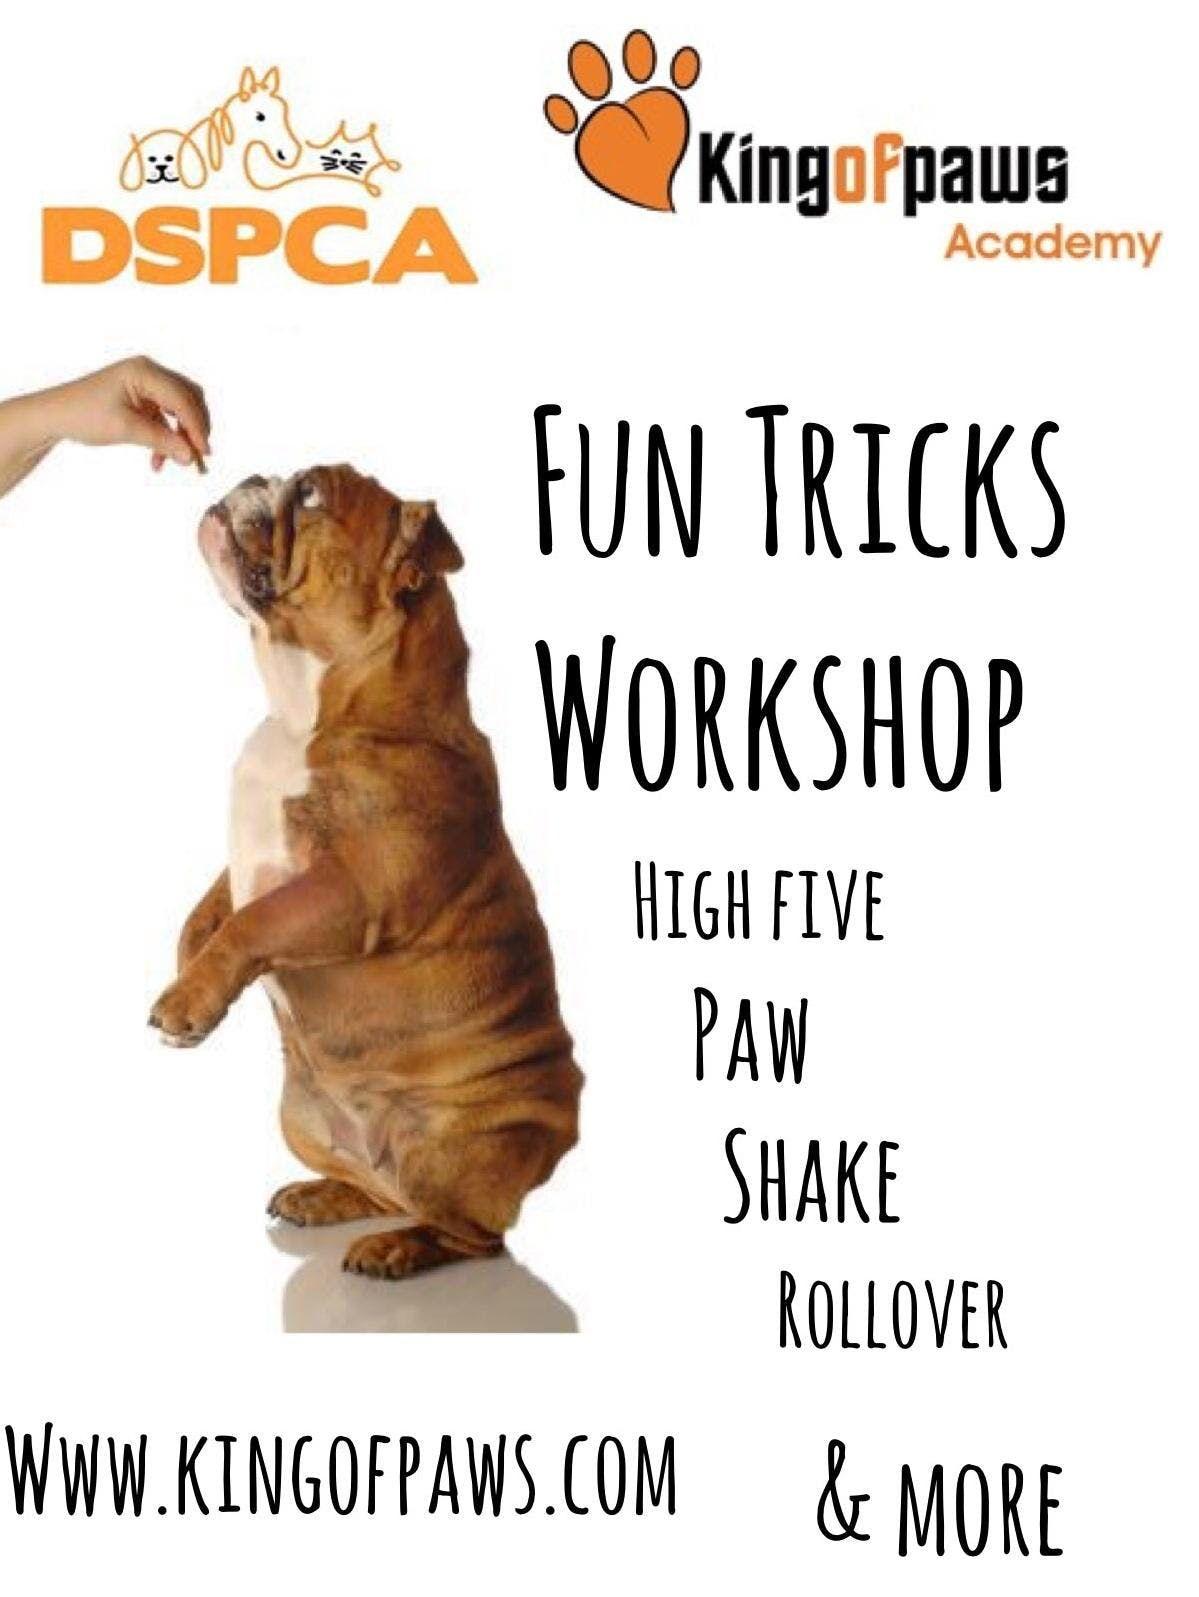 Fun Tricks Workshop  The DSPCA